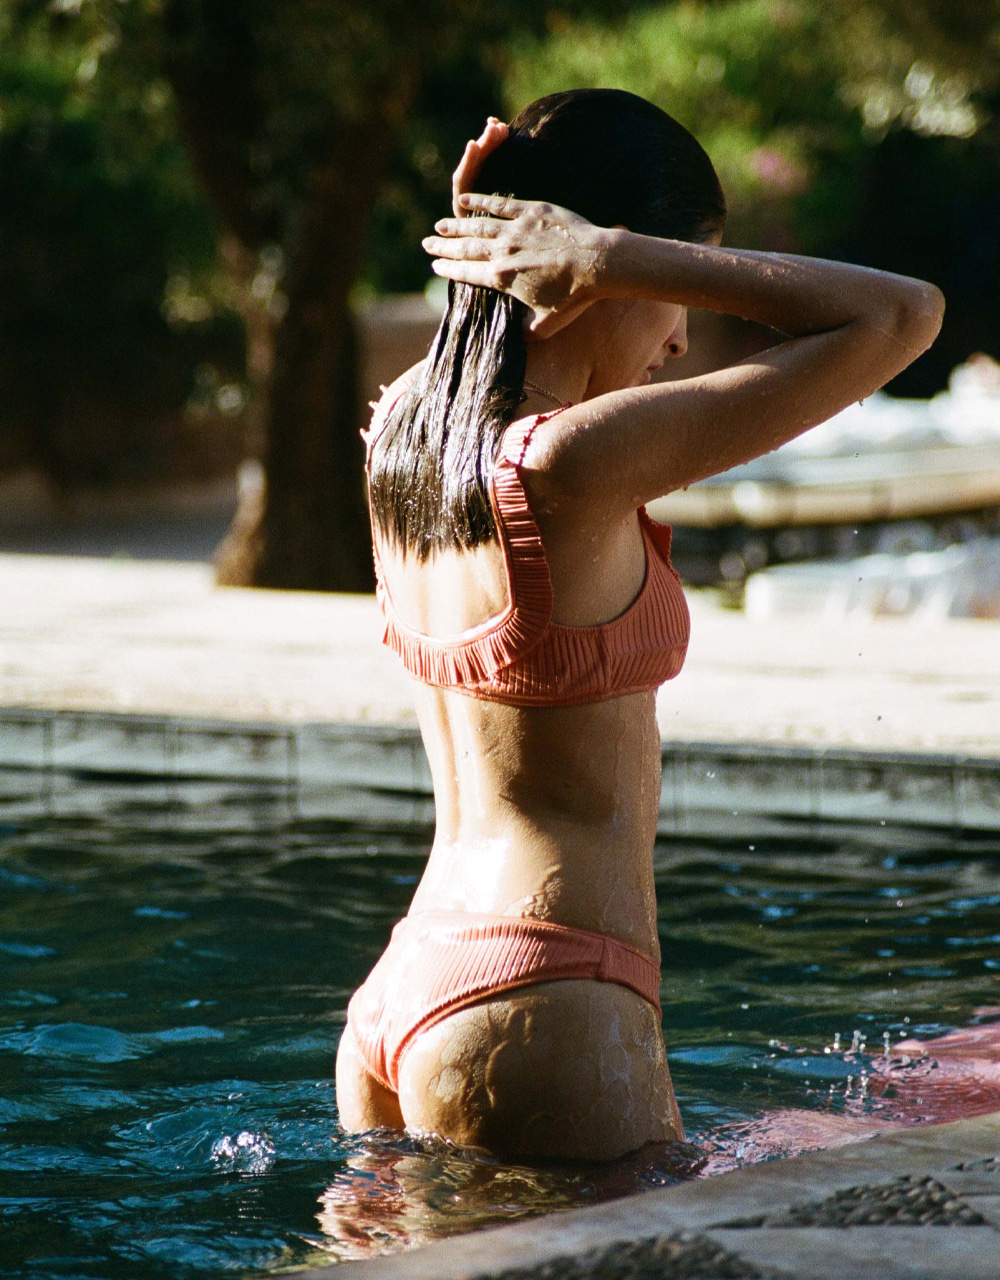 maillot de bain culotte South Abricot 27 € Girls In Paris photo 3